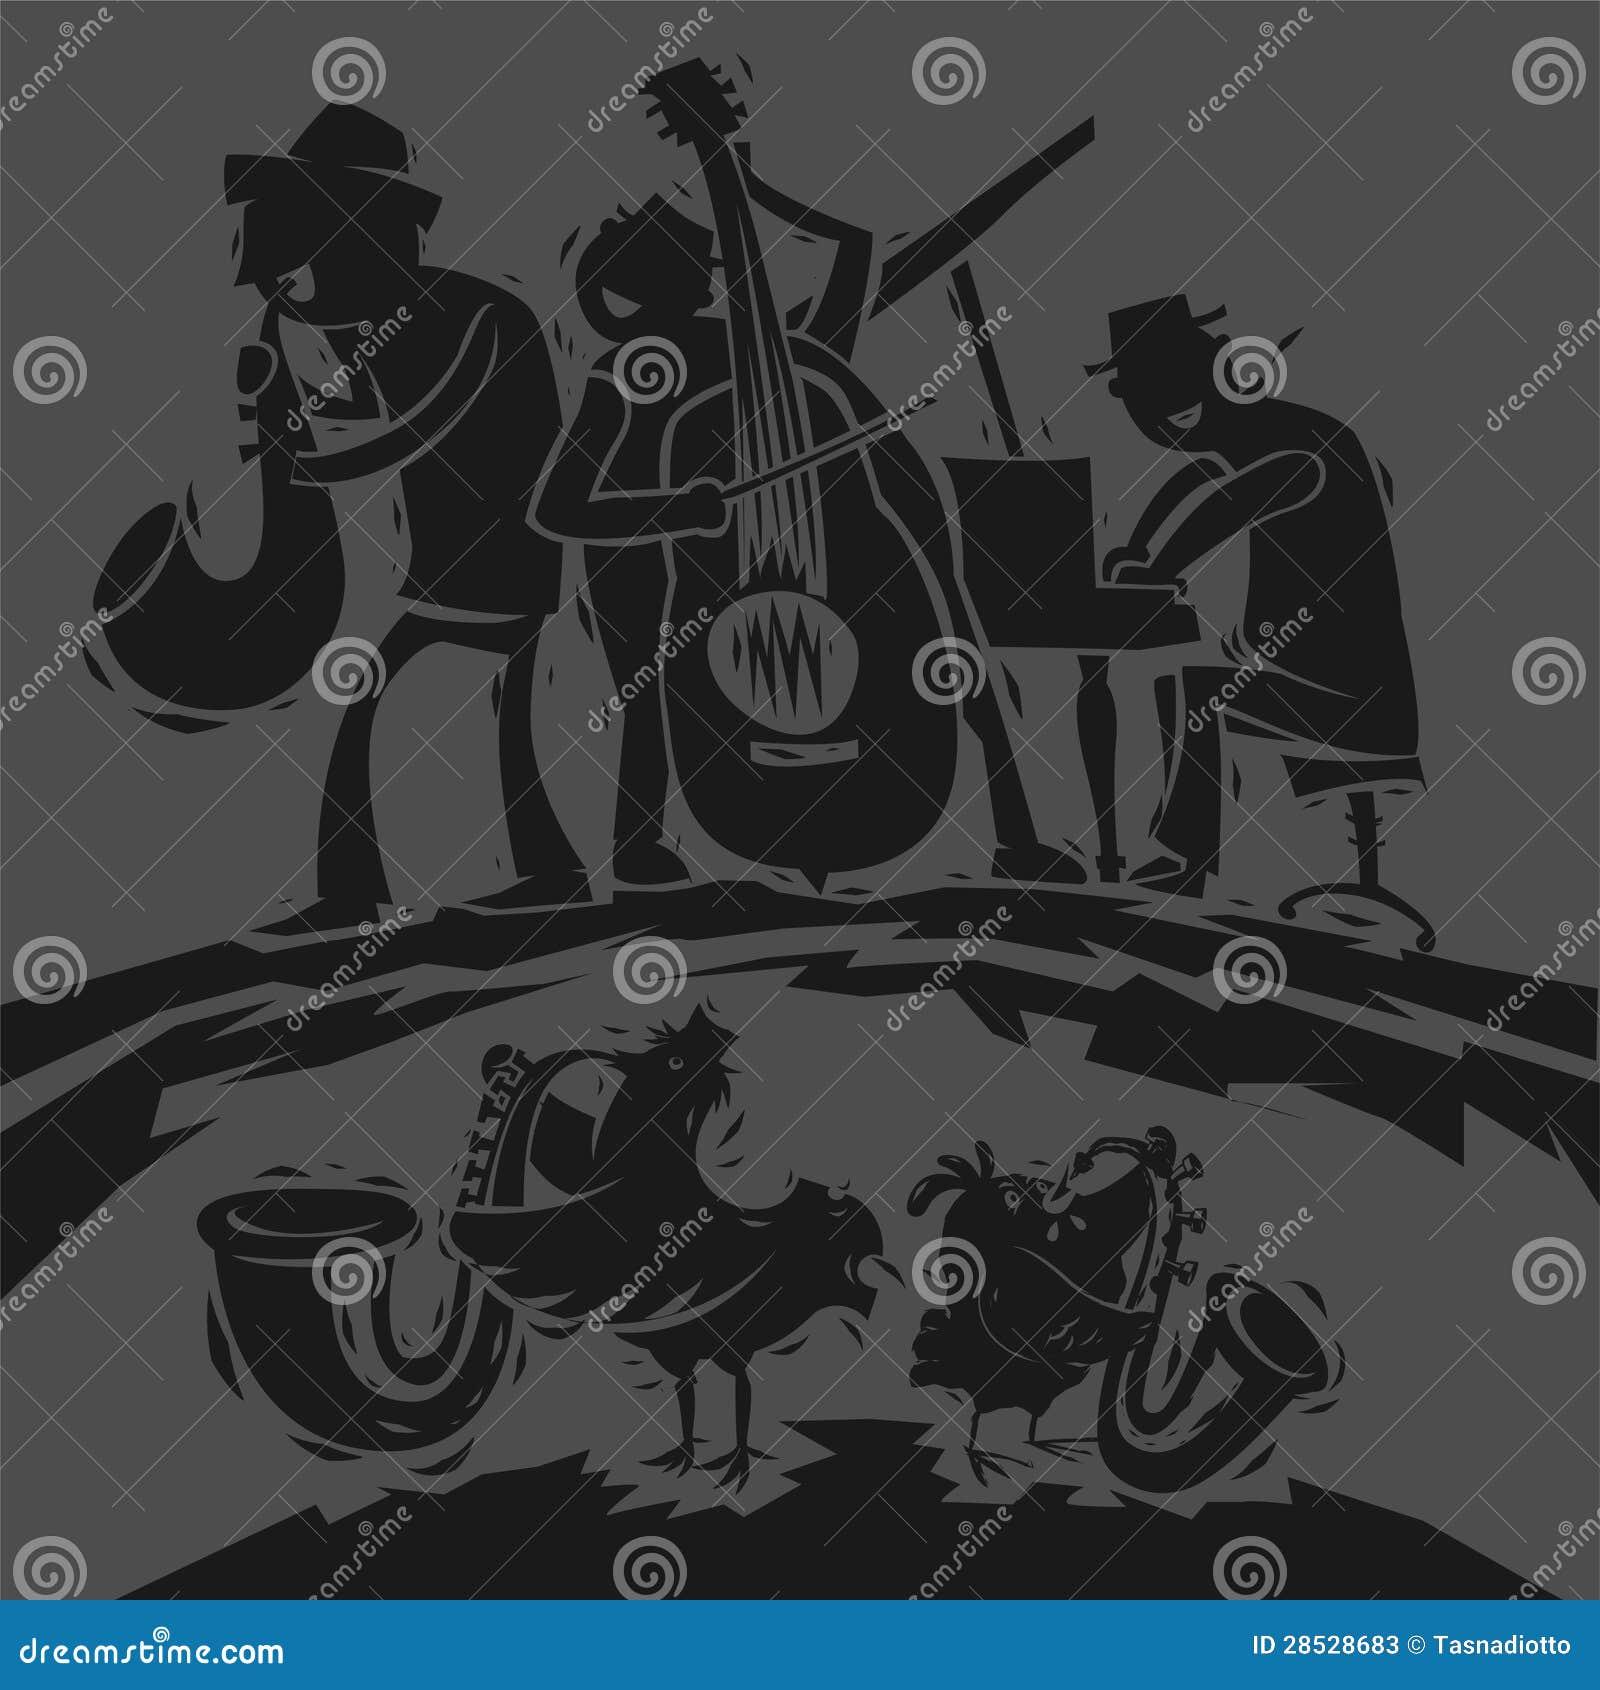 Funny Jazz Musicians